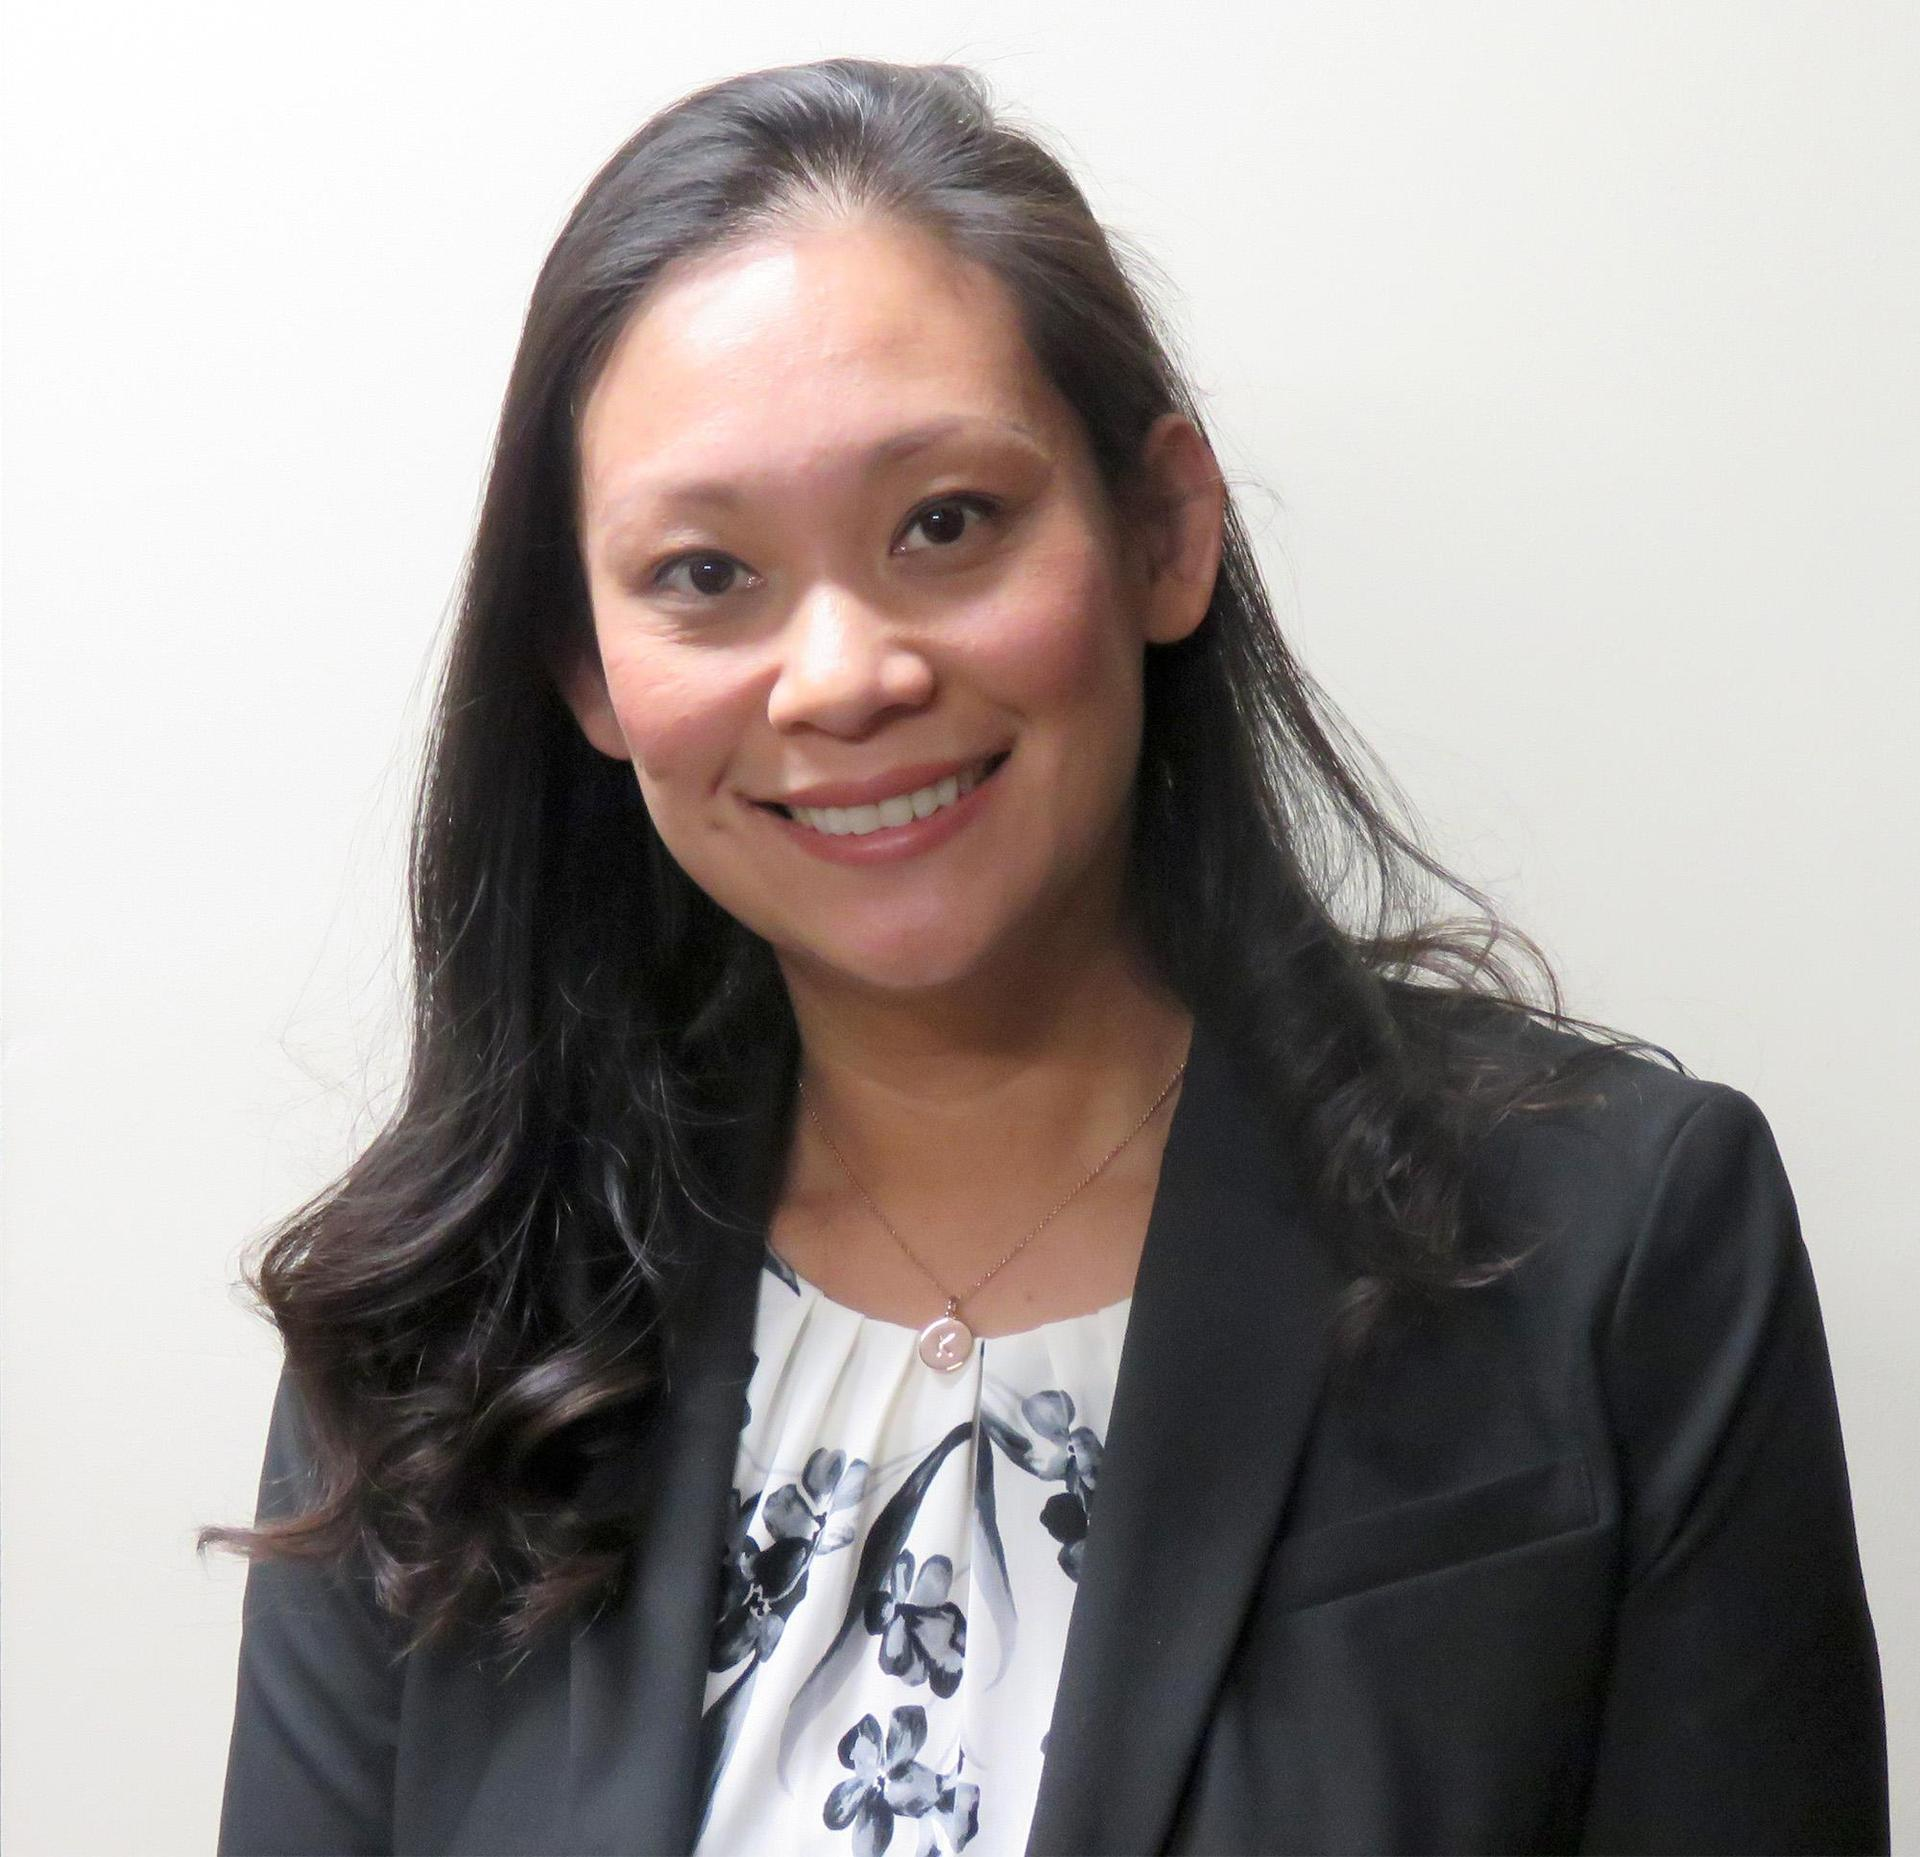 Portrait photo, Deputy Superintendent